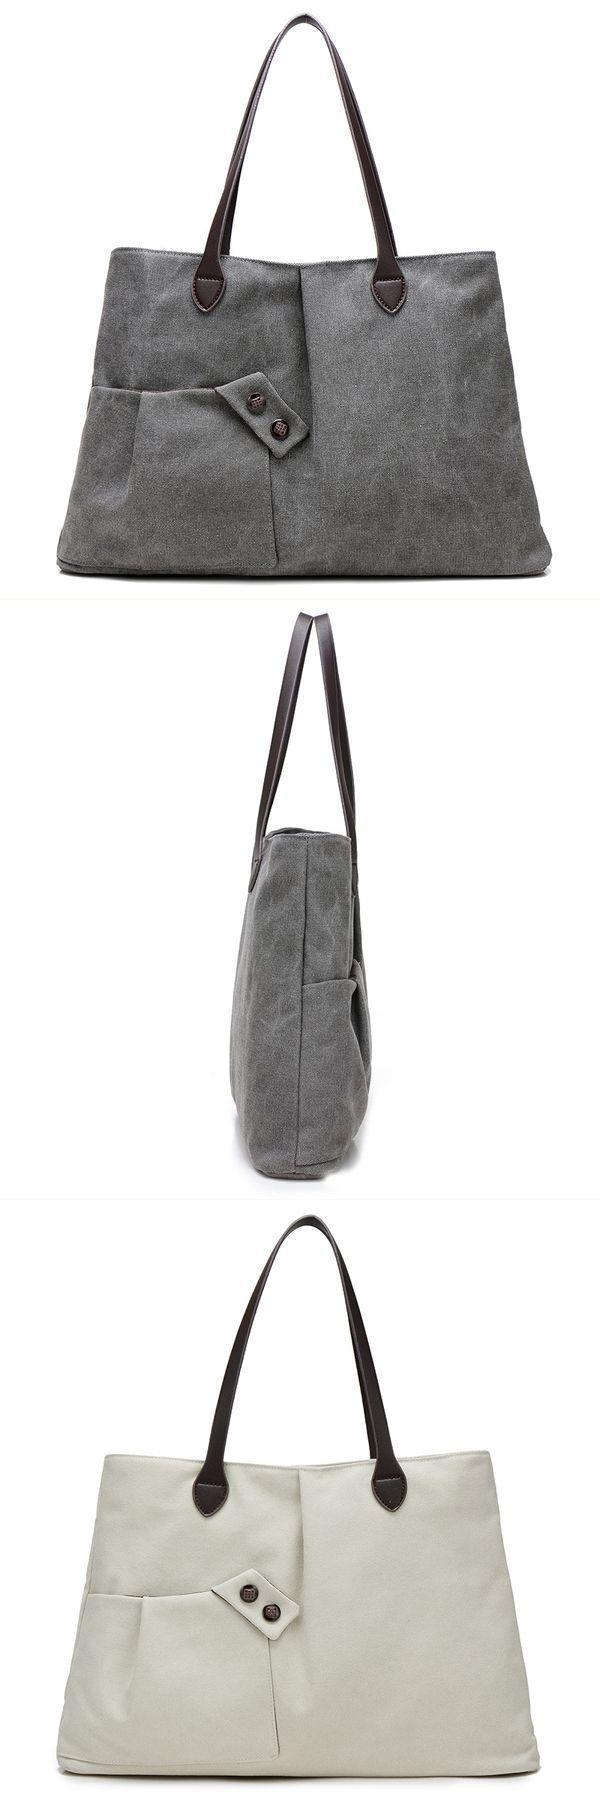 Canvas casual large capacity handbag shoulder bags for women h amp; co handbags #$80 #000 #handbags #f #amp; #d #handbags #handbags #r #us #anderson #sc #ramp;j #handbags #by #romeo #amp; #juliet #couture